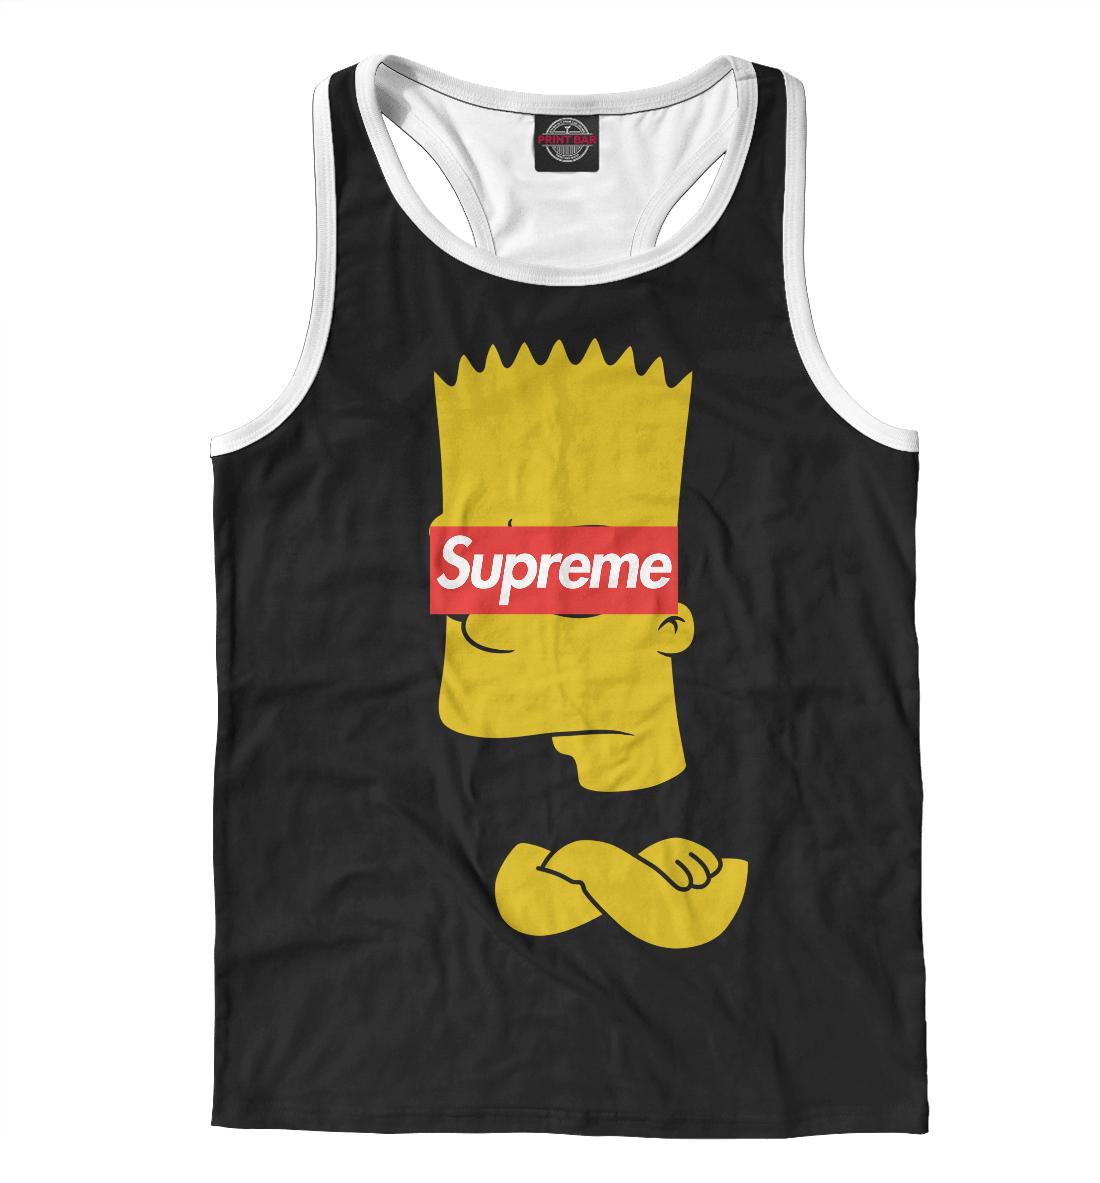 Купить Supreme Simpsons, Printbar, Майки борцовки, SPR-402256-mayb-2